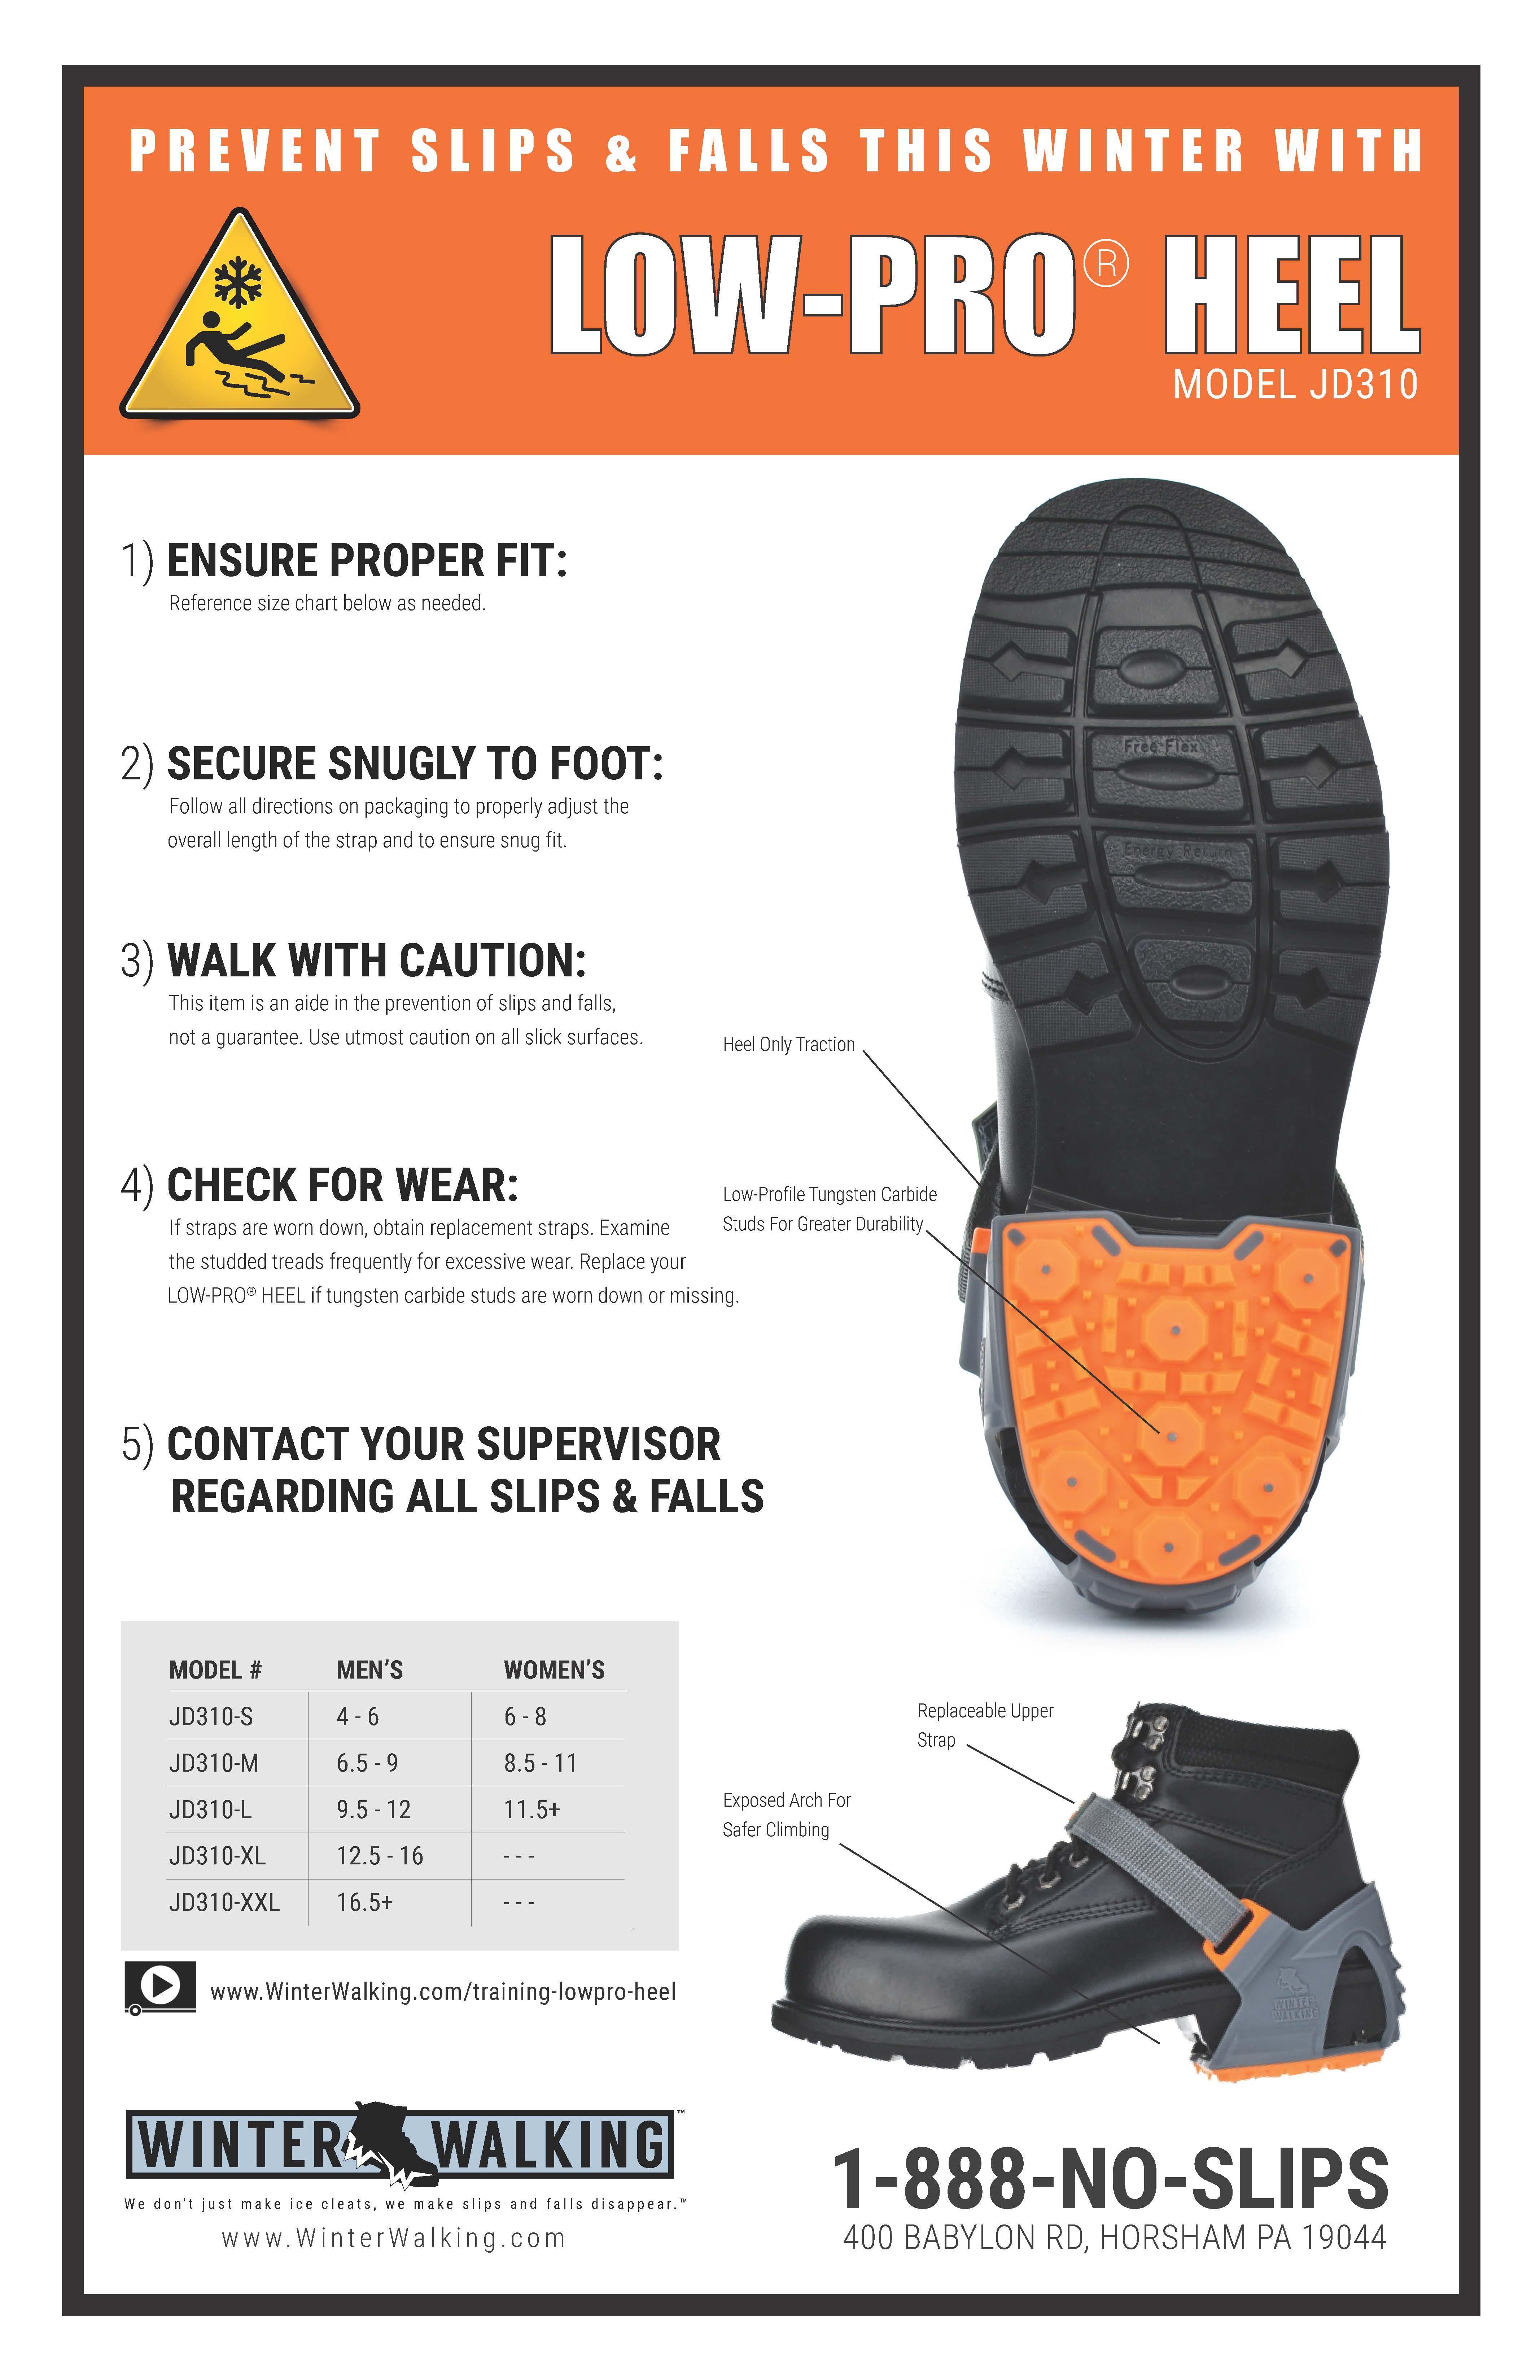 Low Pro Heel - Training Poster